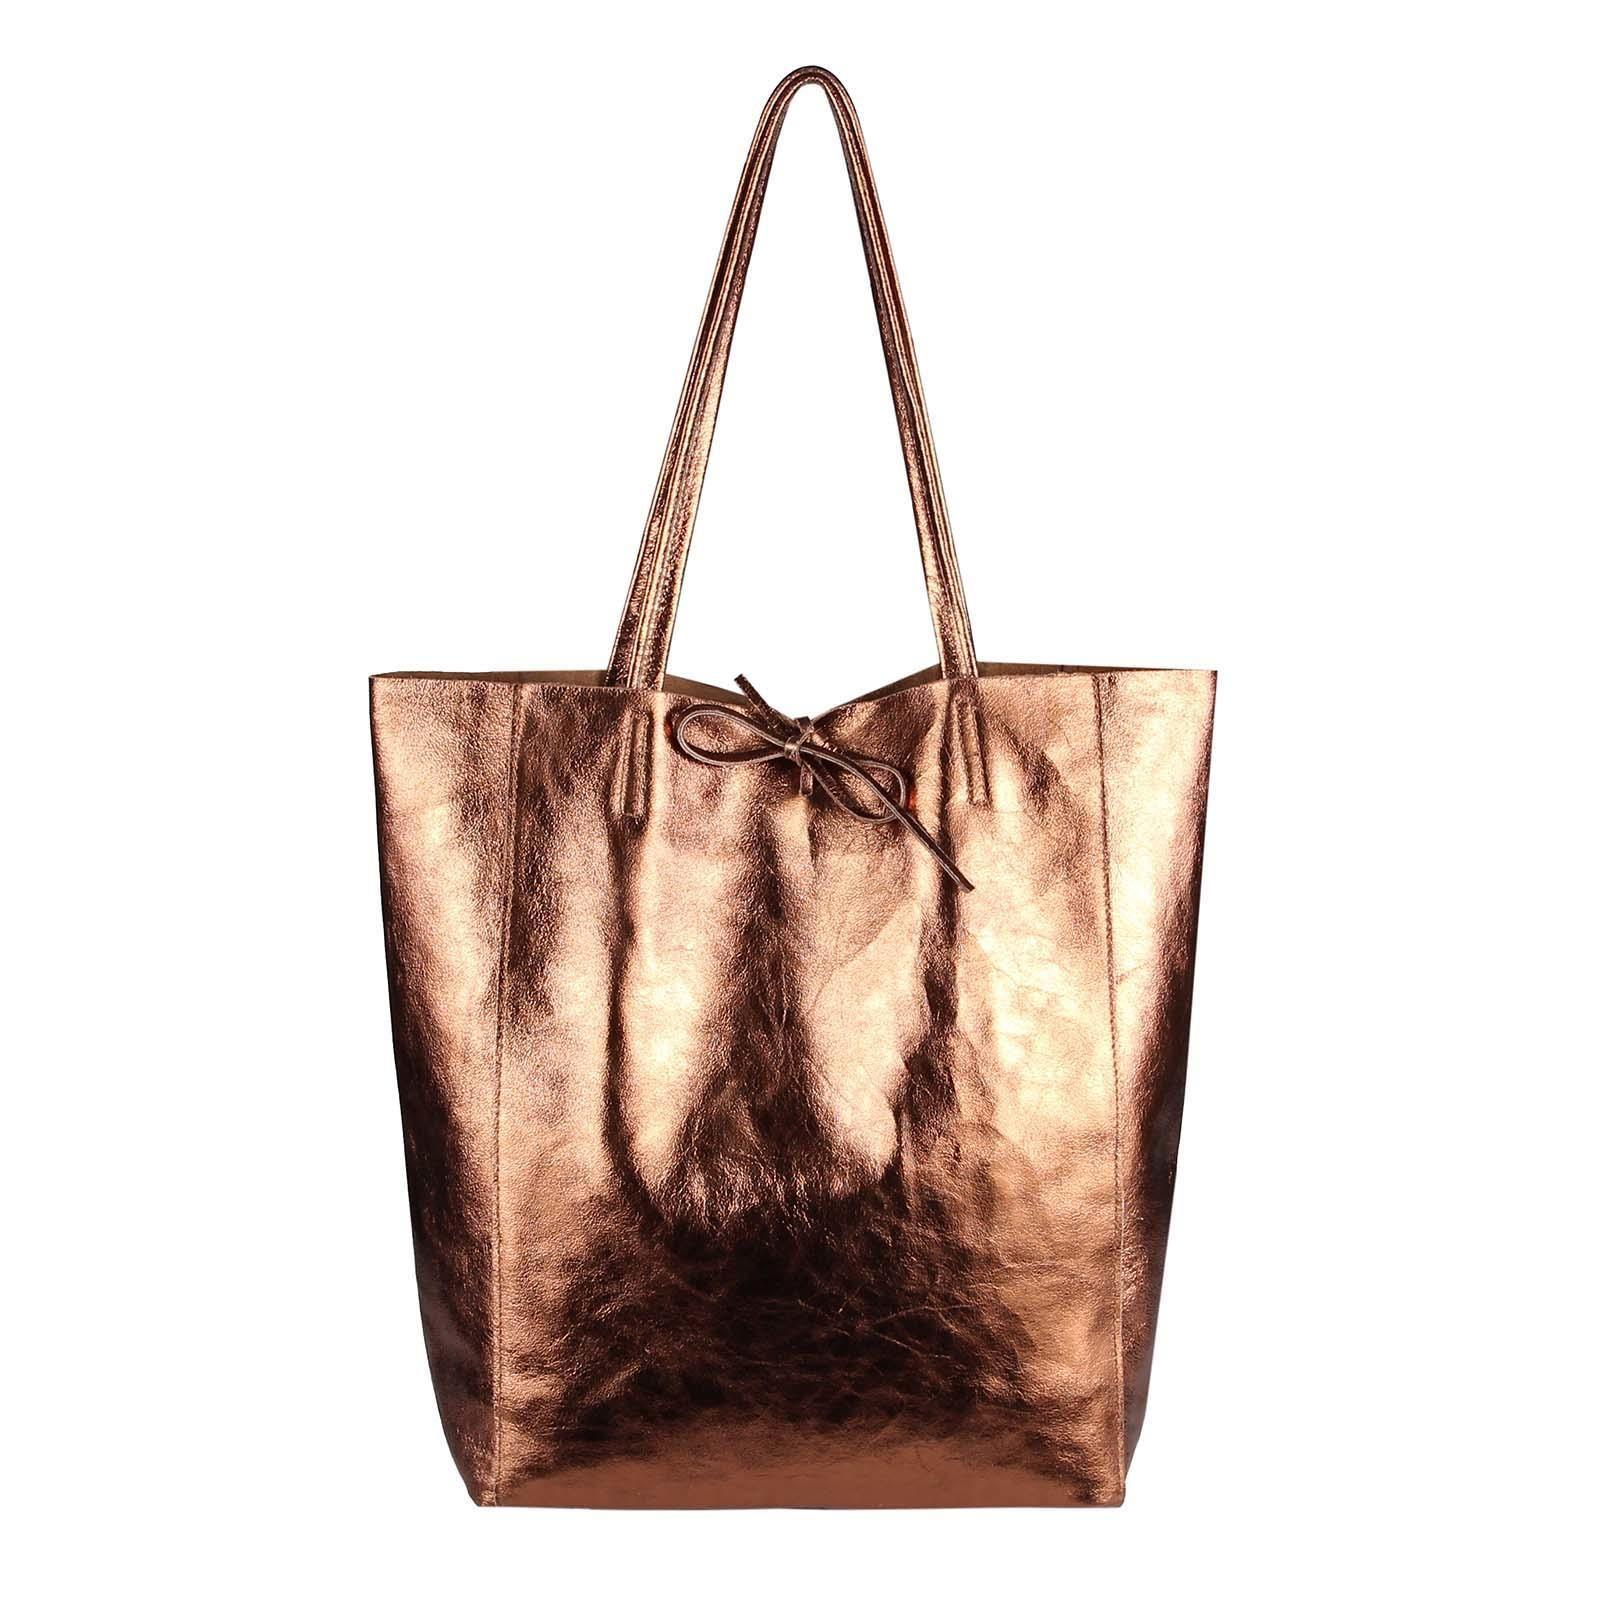 57349e47b72ec OBC Made in Italy DAMEN LEDER TASCHE DIN-A4 Shopper Schultertasche  Henkeltasche Tote Bag Metallic